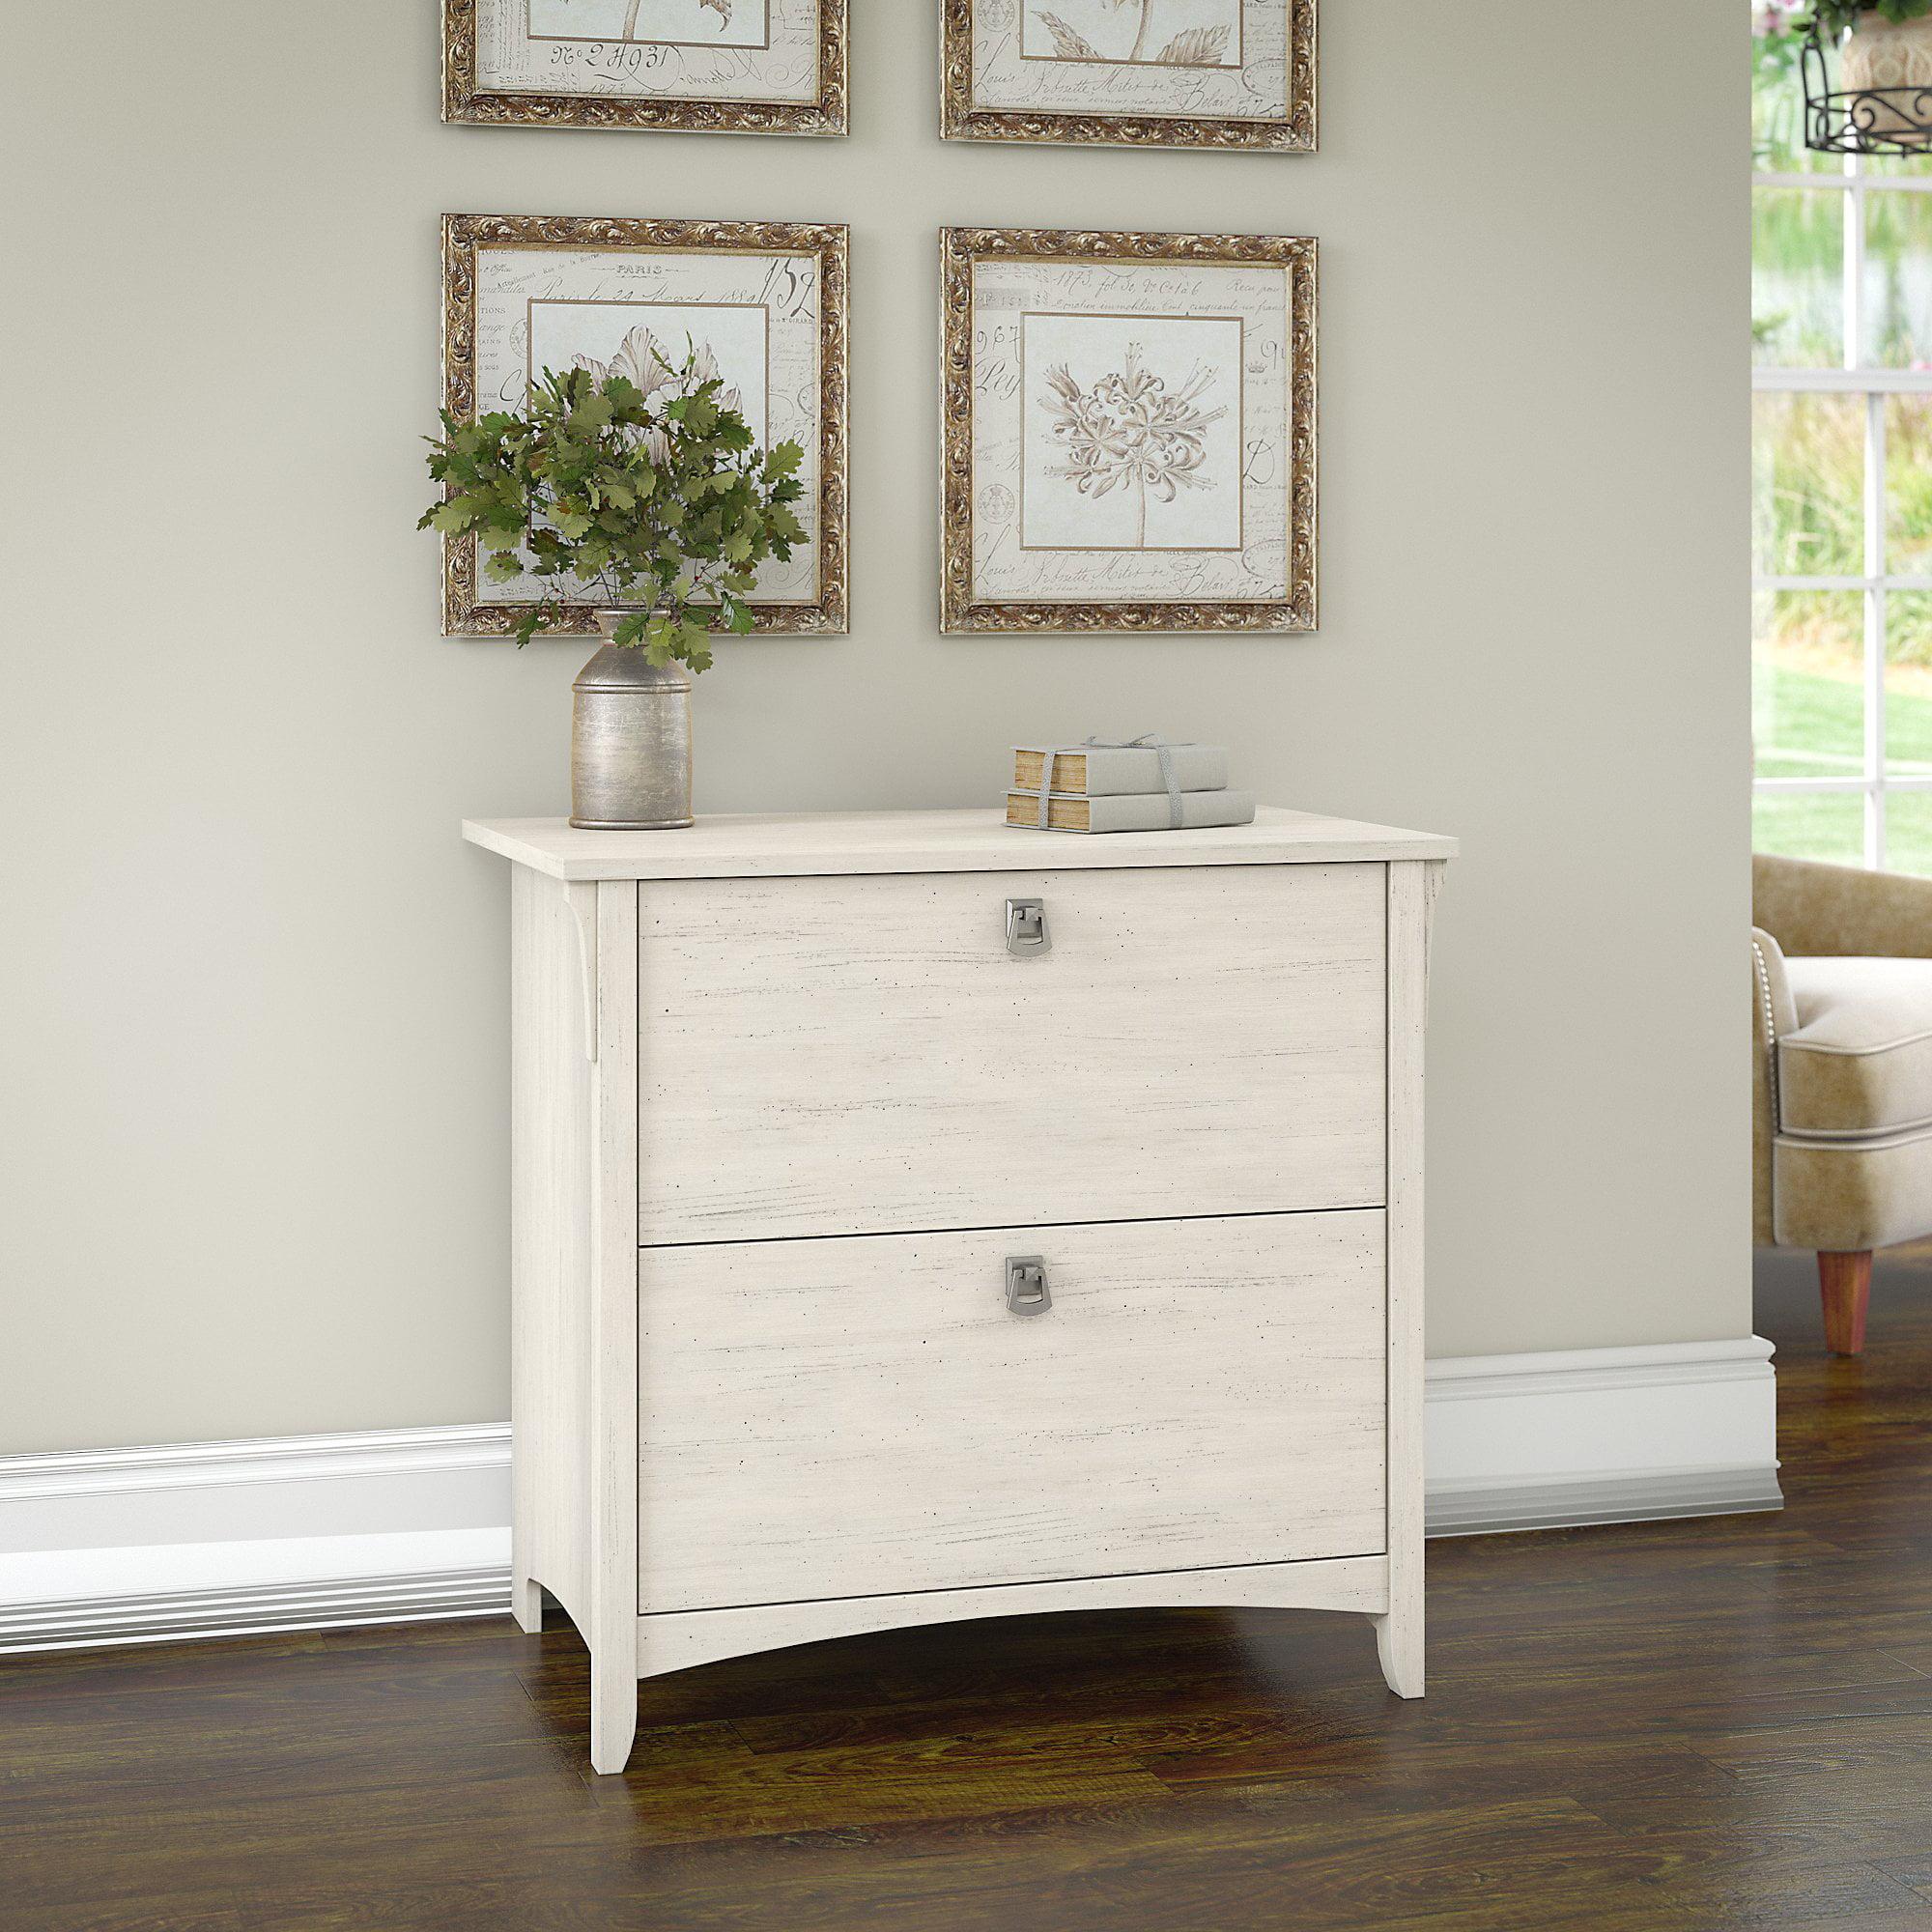 Superbe Bush Furniture Salinas Lateral File Cabinet In Antique White